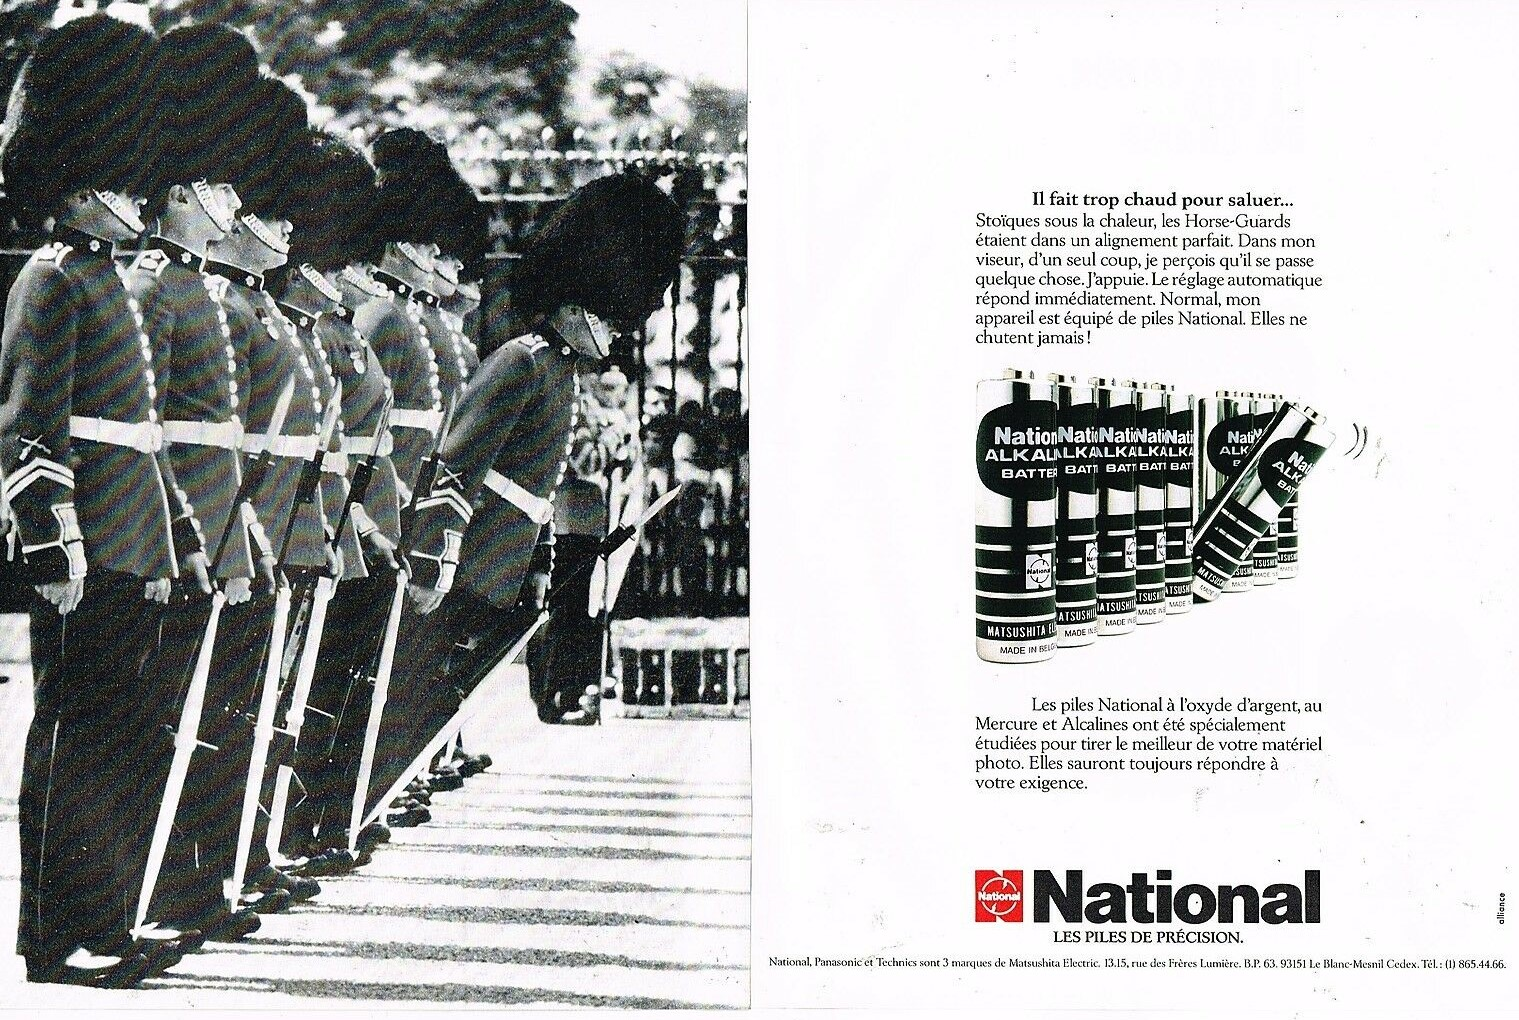 1983 Les Piles National